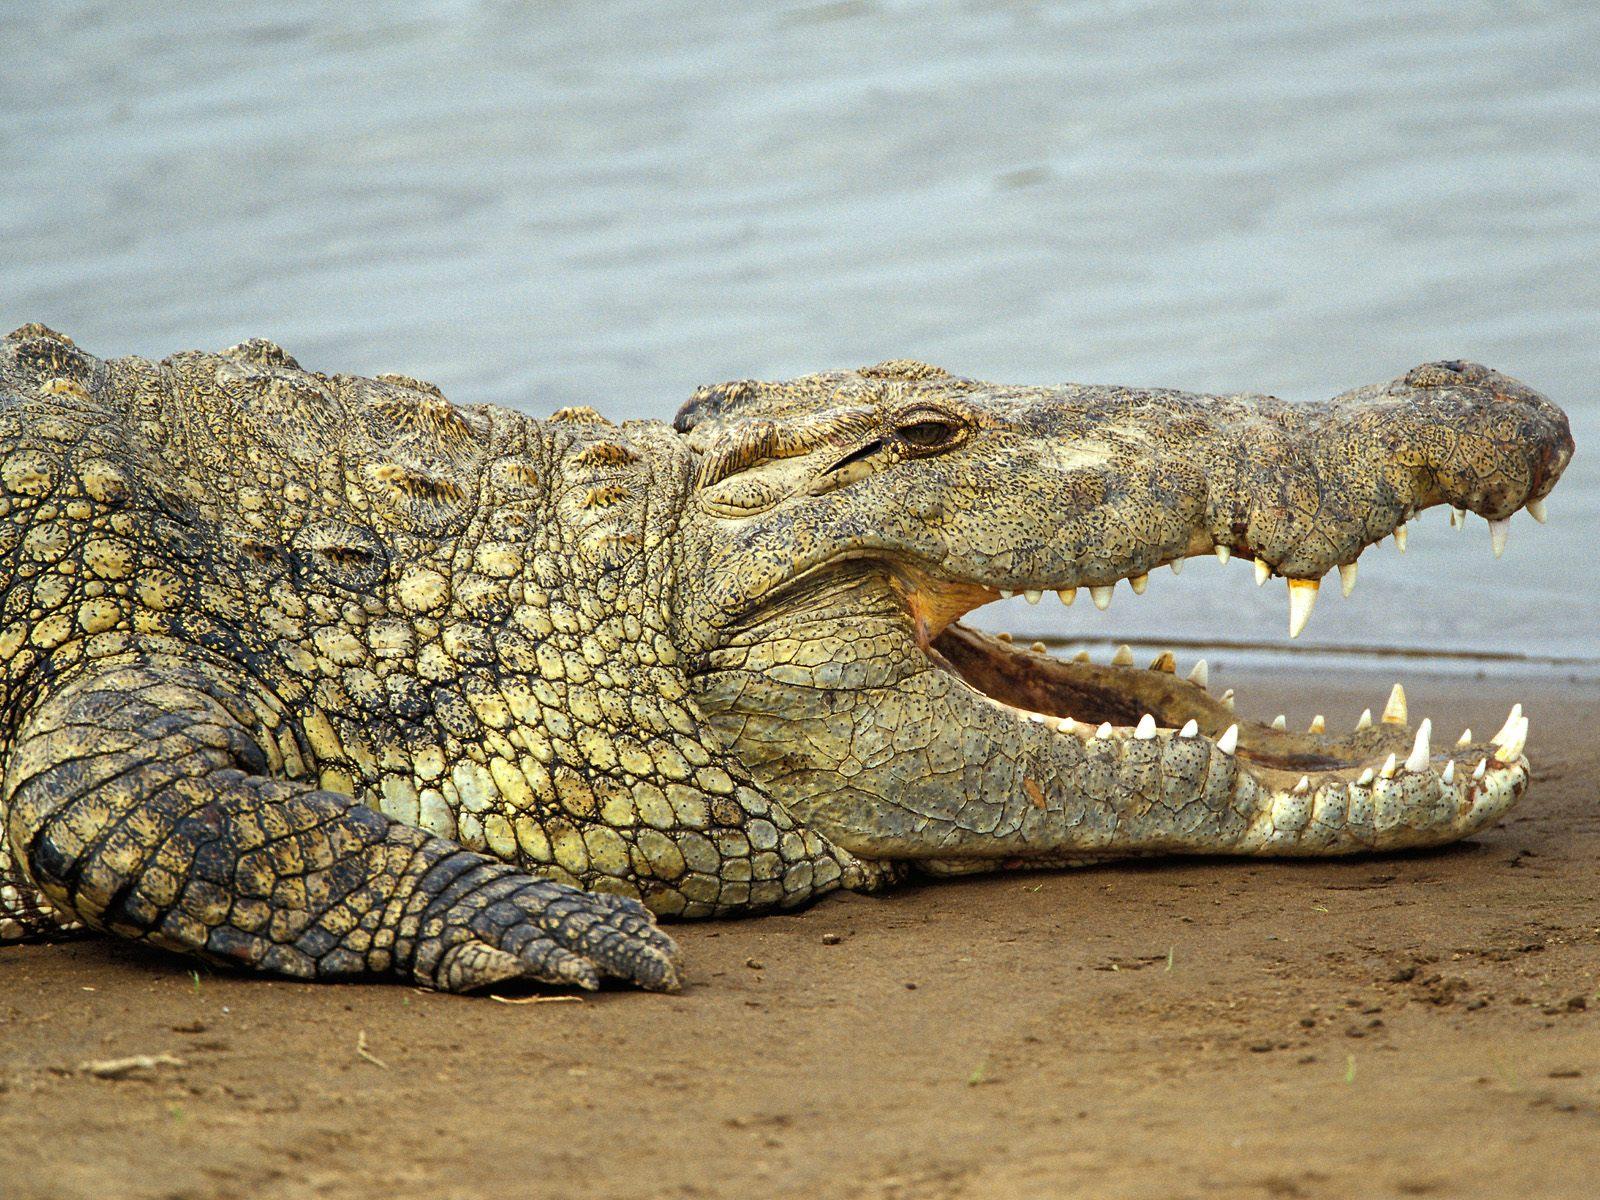 egyptian plover nile crocodile symbiotic relationship